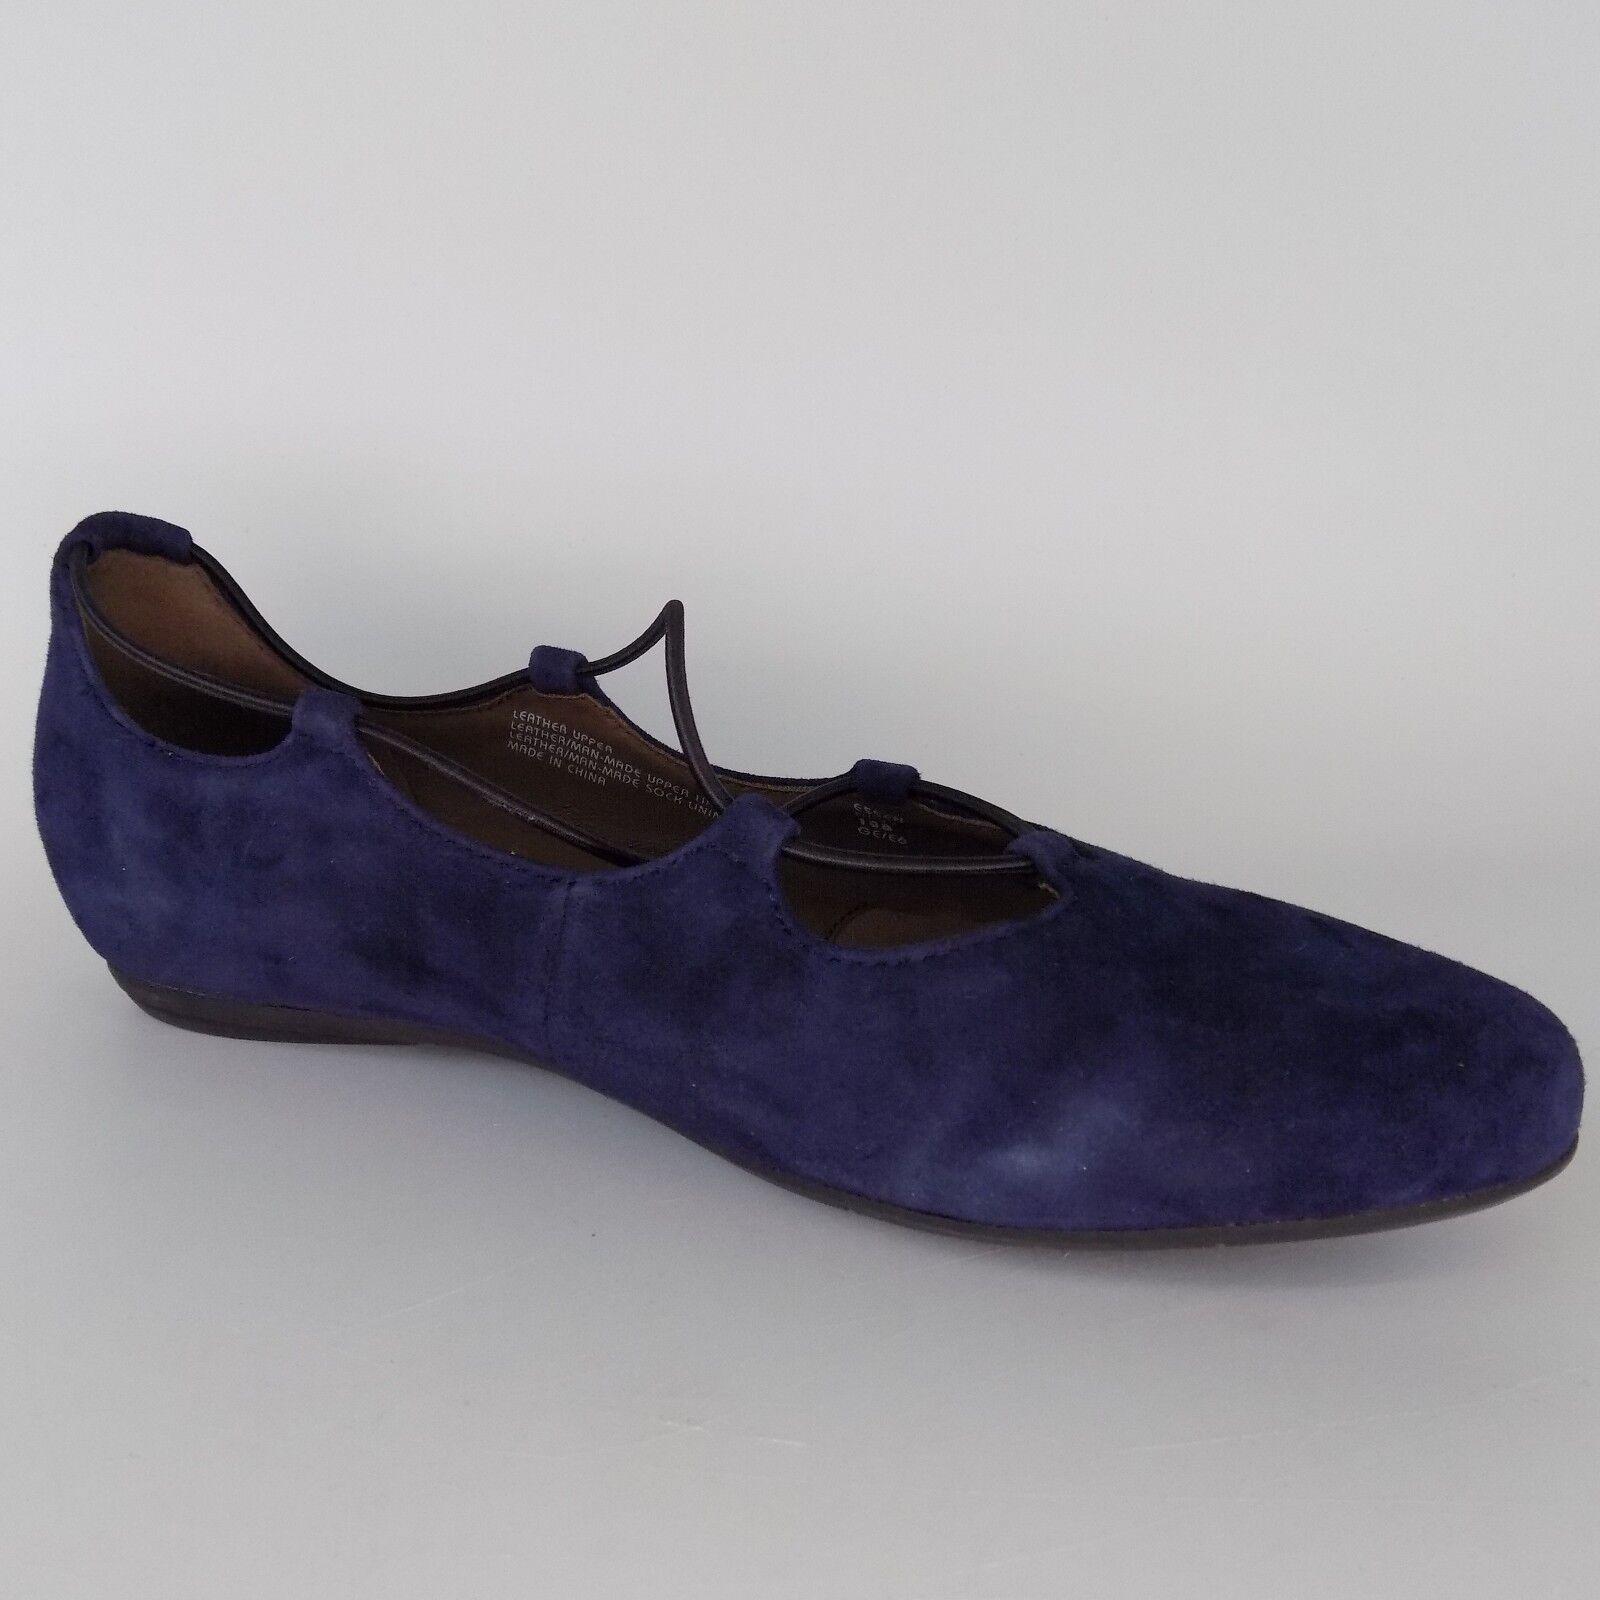 Earthies Essen Slip On Casual Comfort Navy Women shoes Size 10 B AL2388